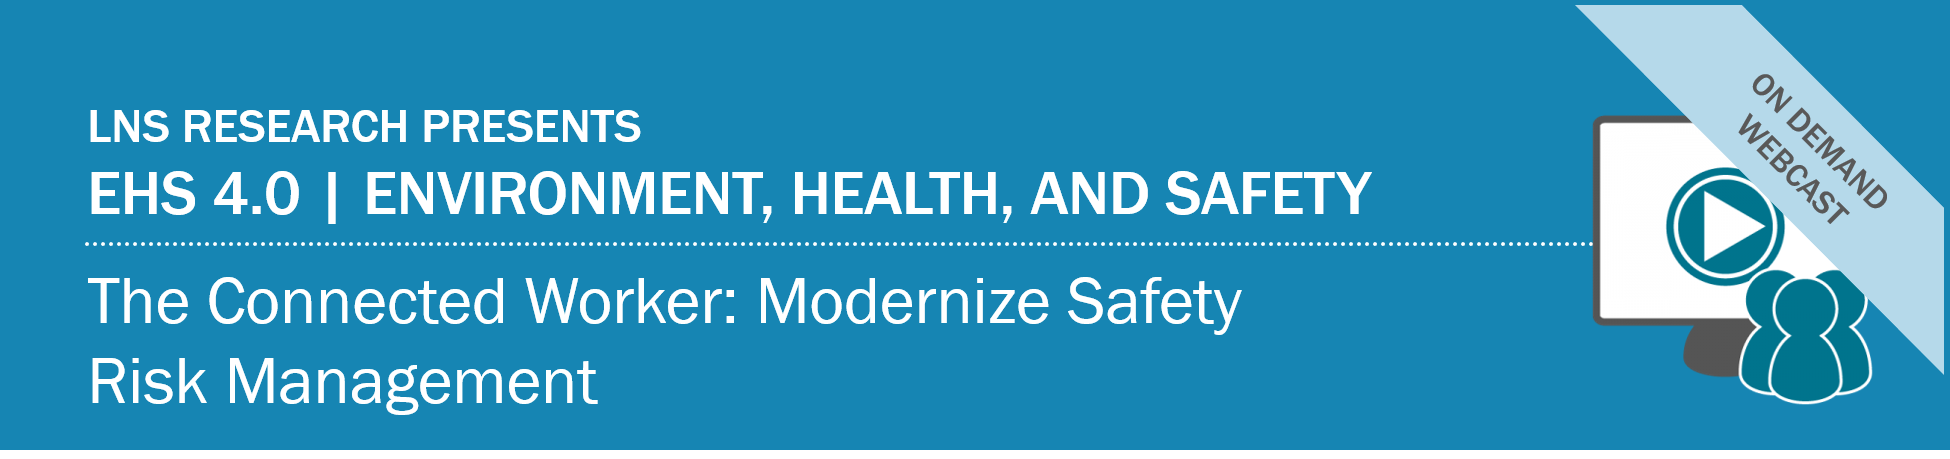 On-demand webcast: The Connected Worker: Modernize Safety Risk Management